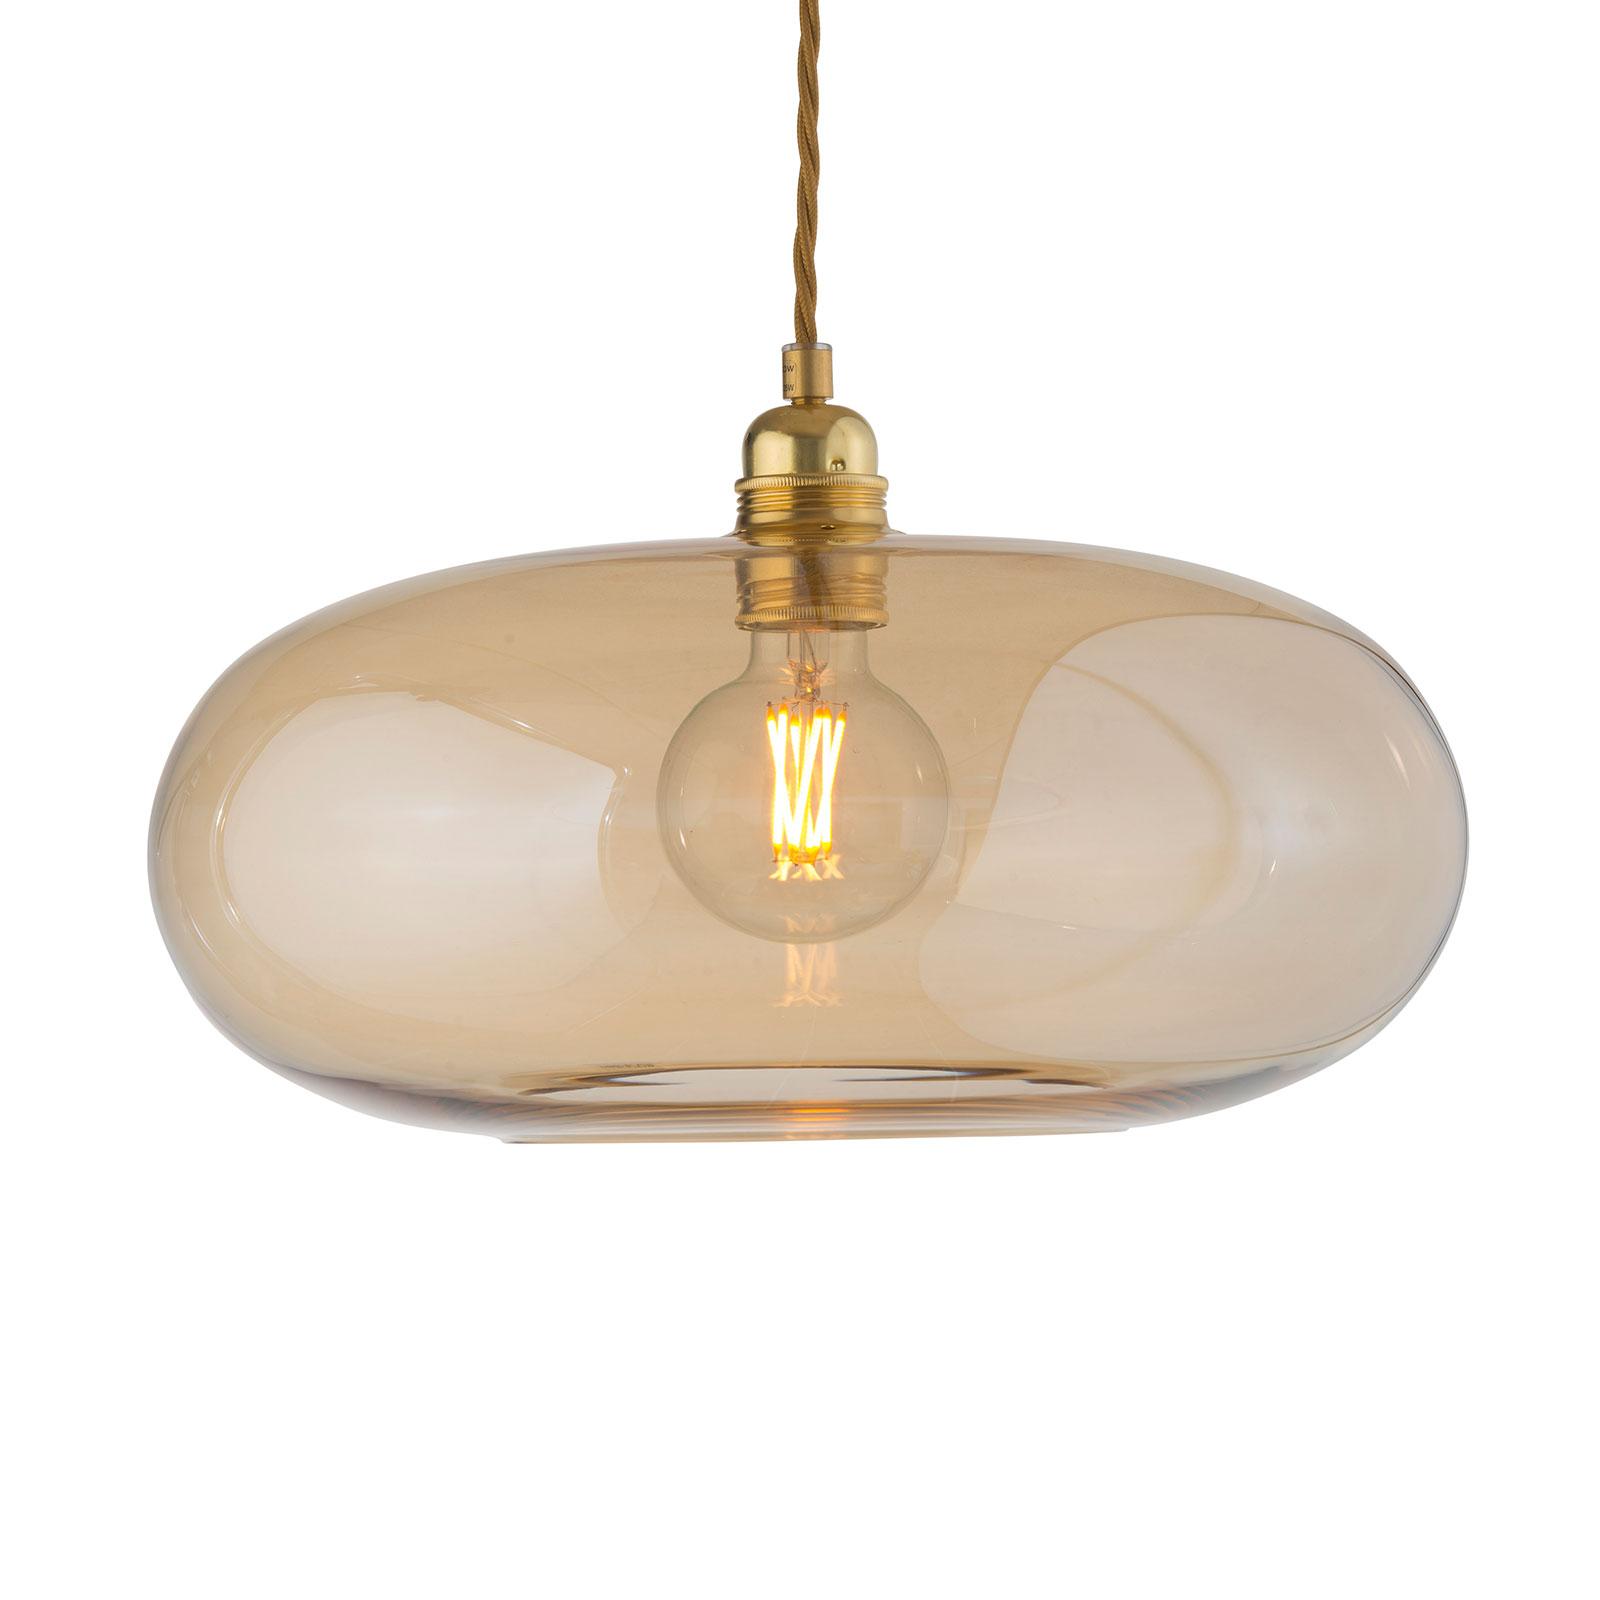 EBB & FLOW Horizon hanglamp goud rook Ø 36 cm